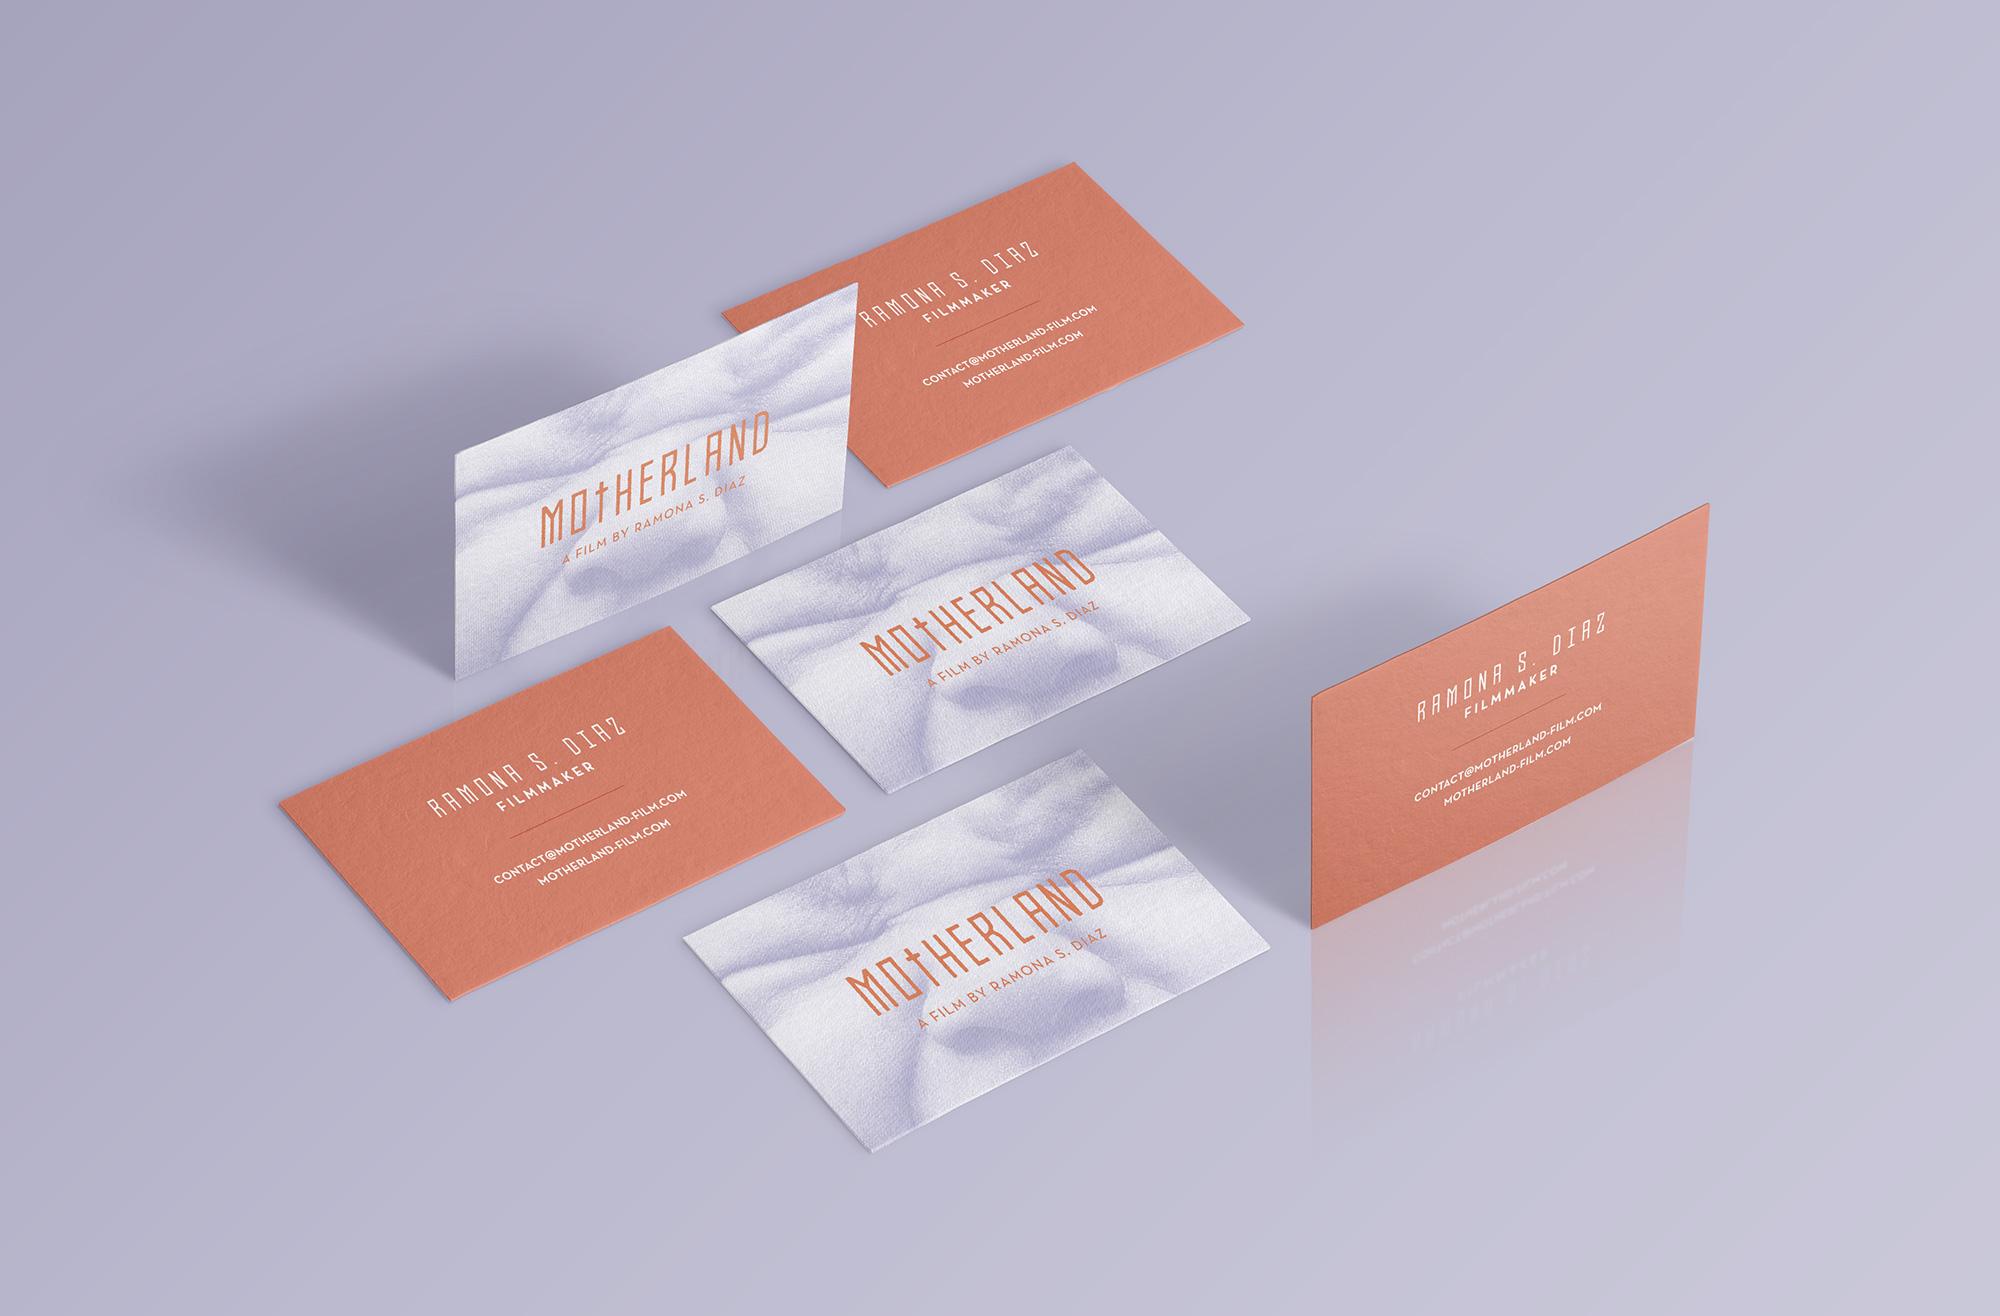 motherland_cards